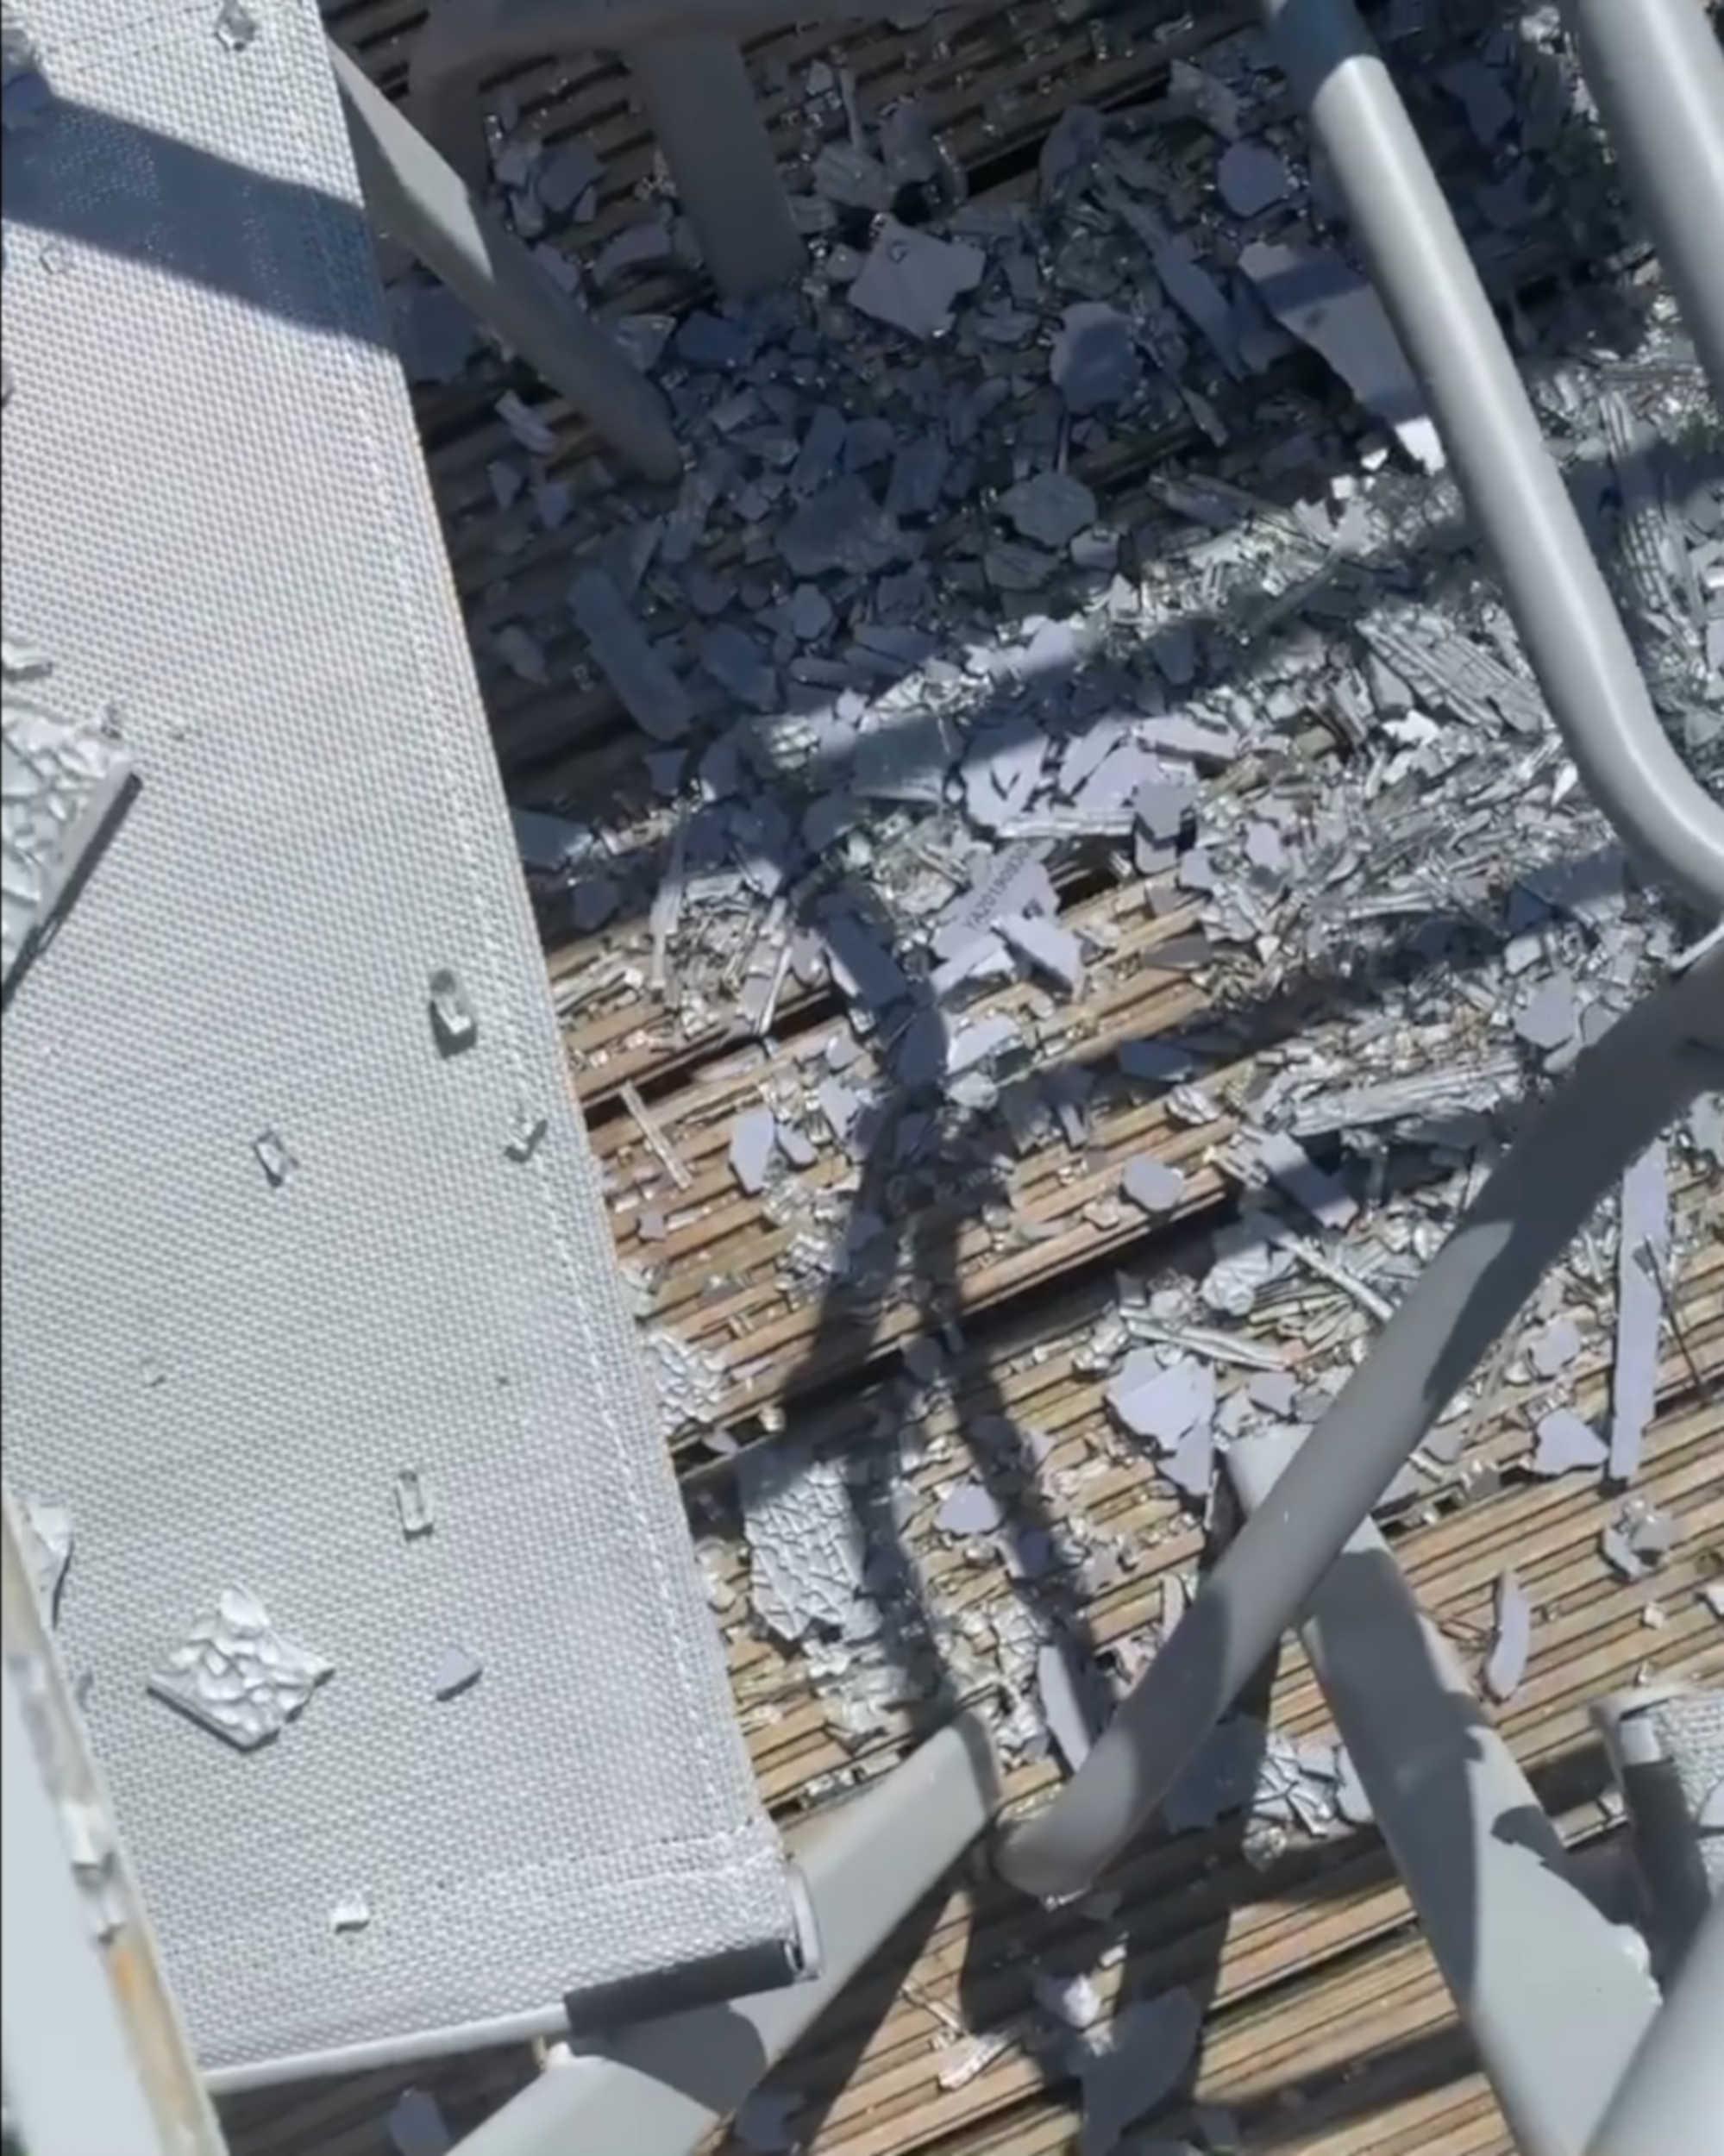 Shards of Argos table